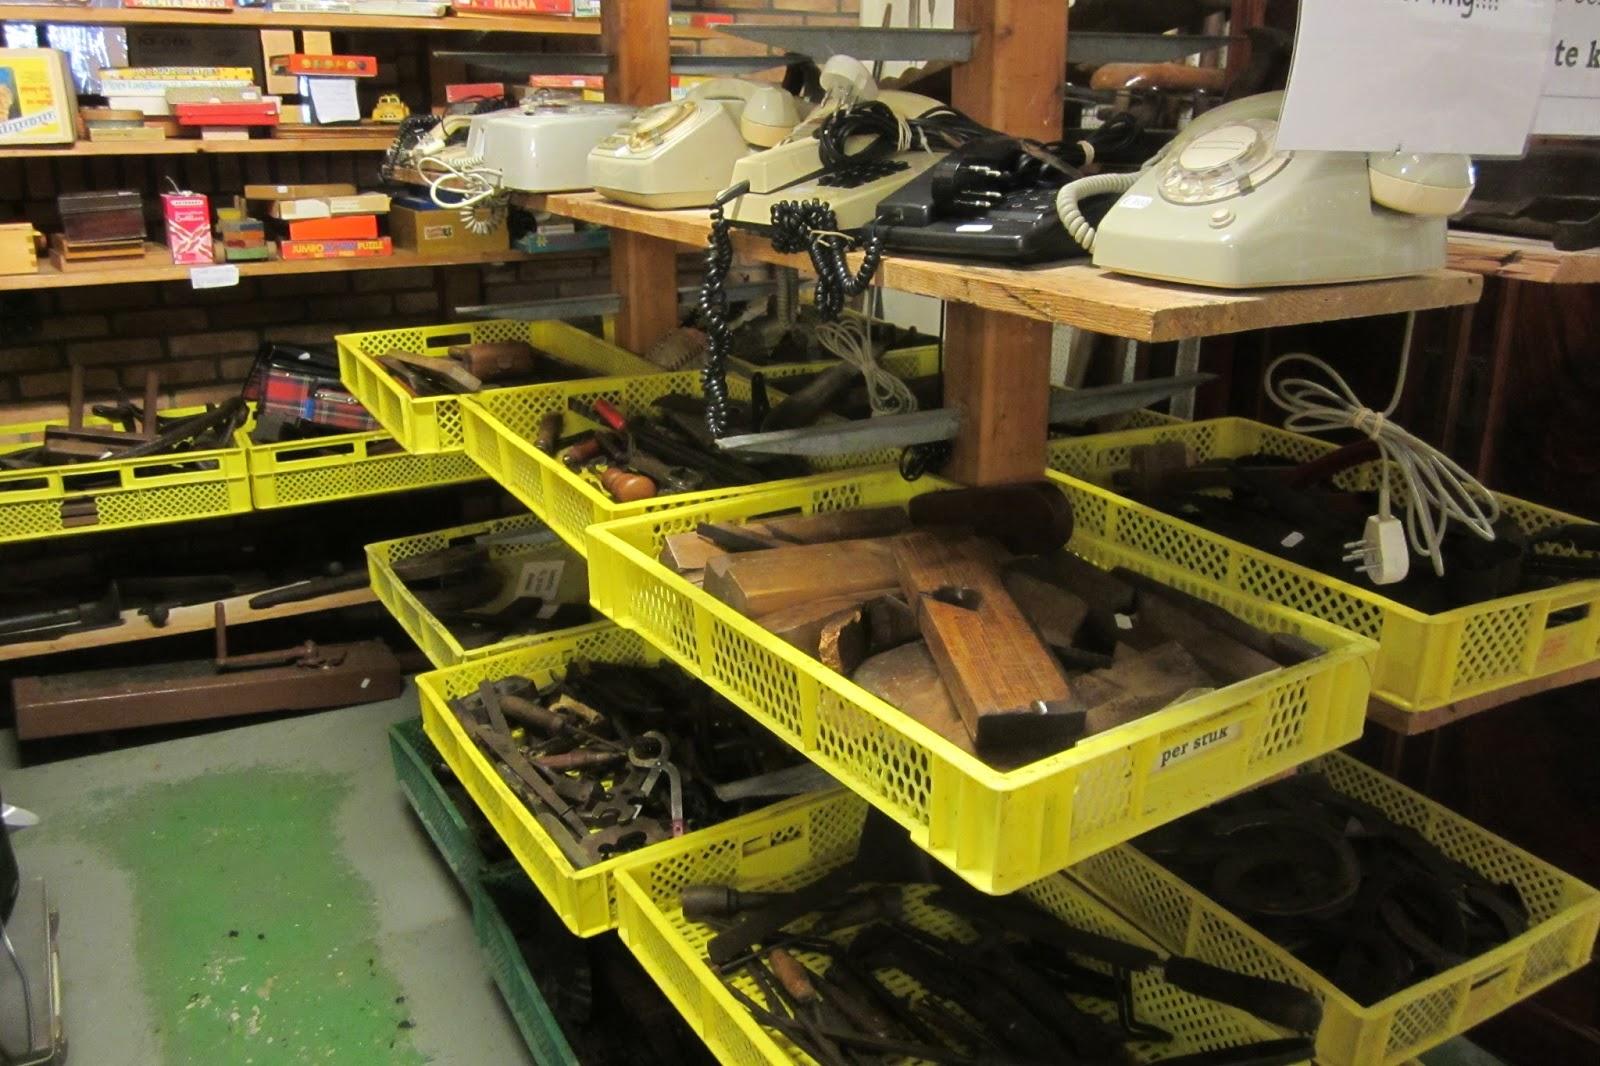 David Barron Furniture: Wonderful Old Crafts Museum in Holland. Part 1